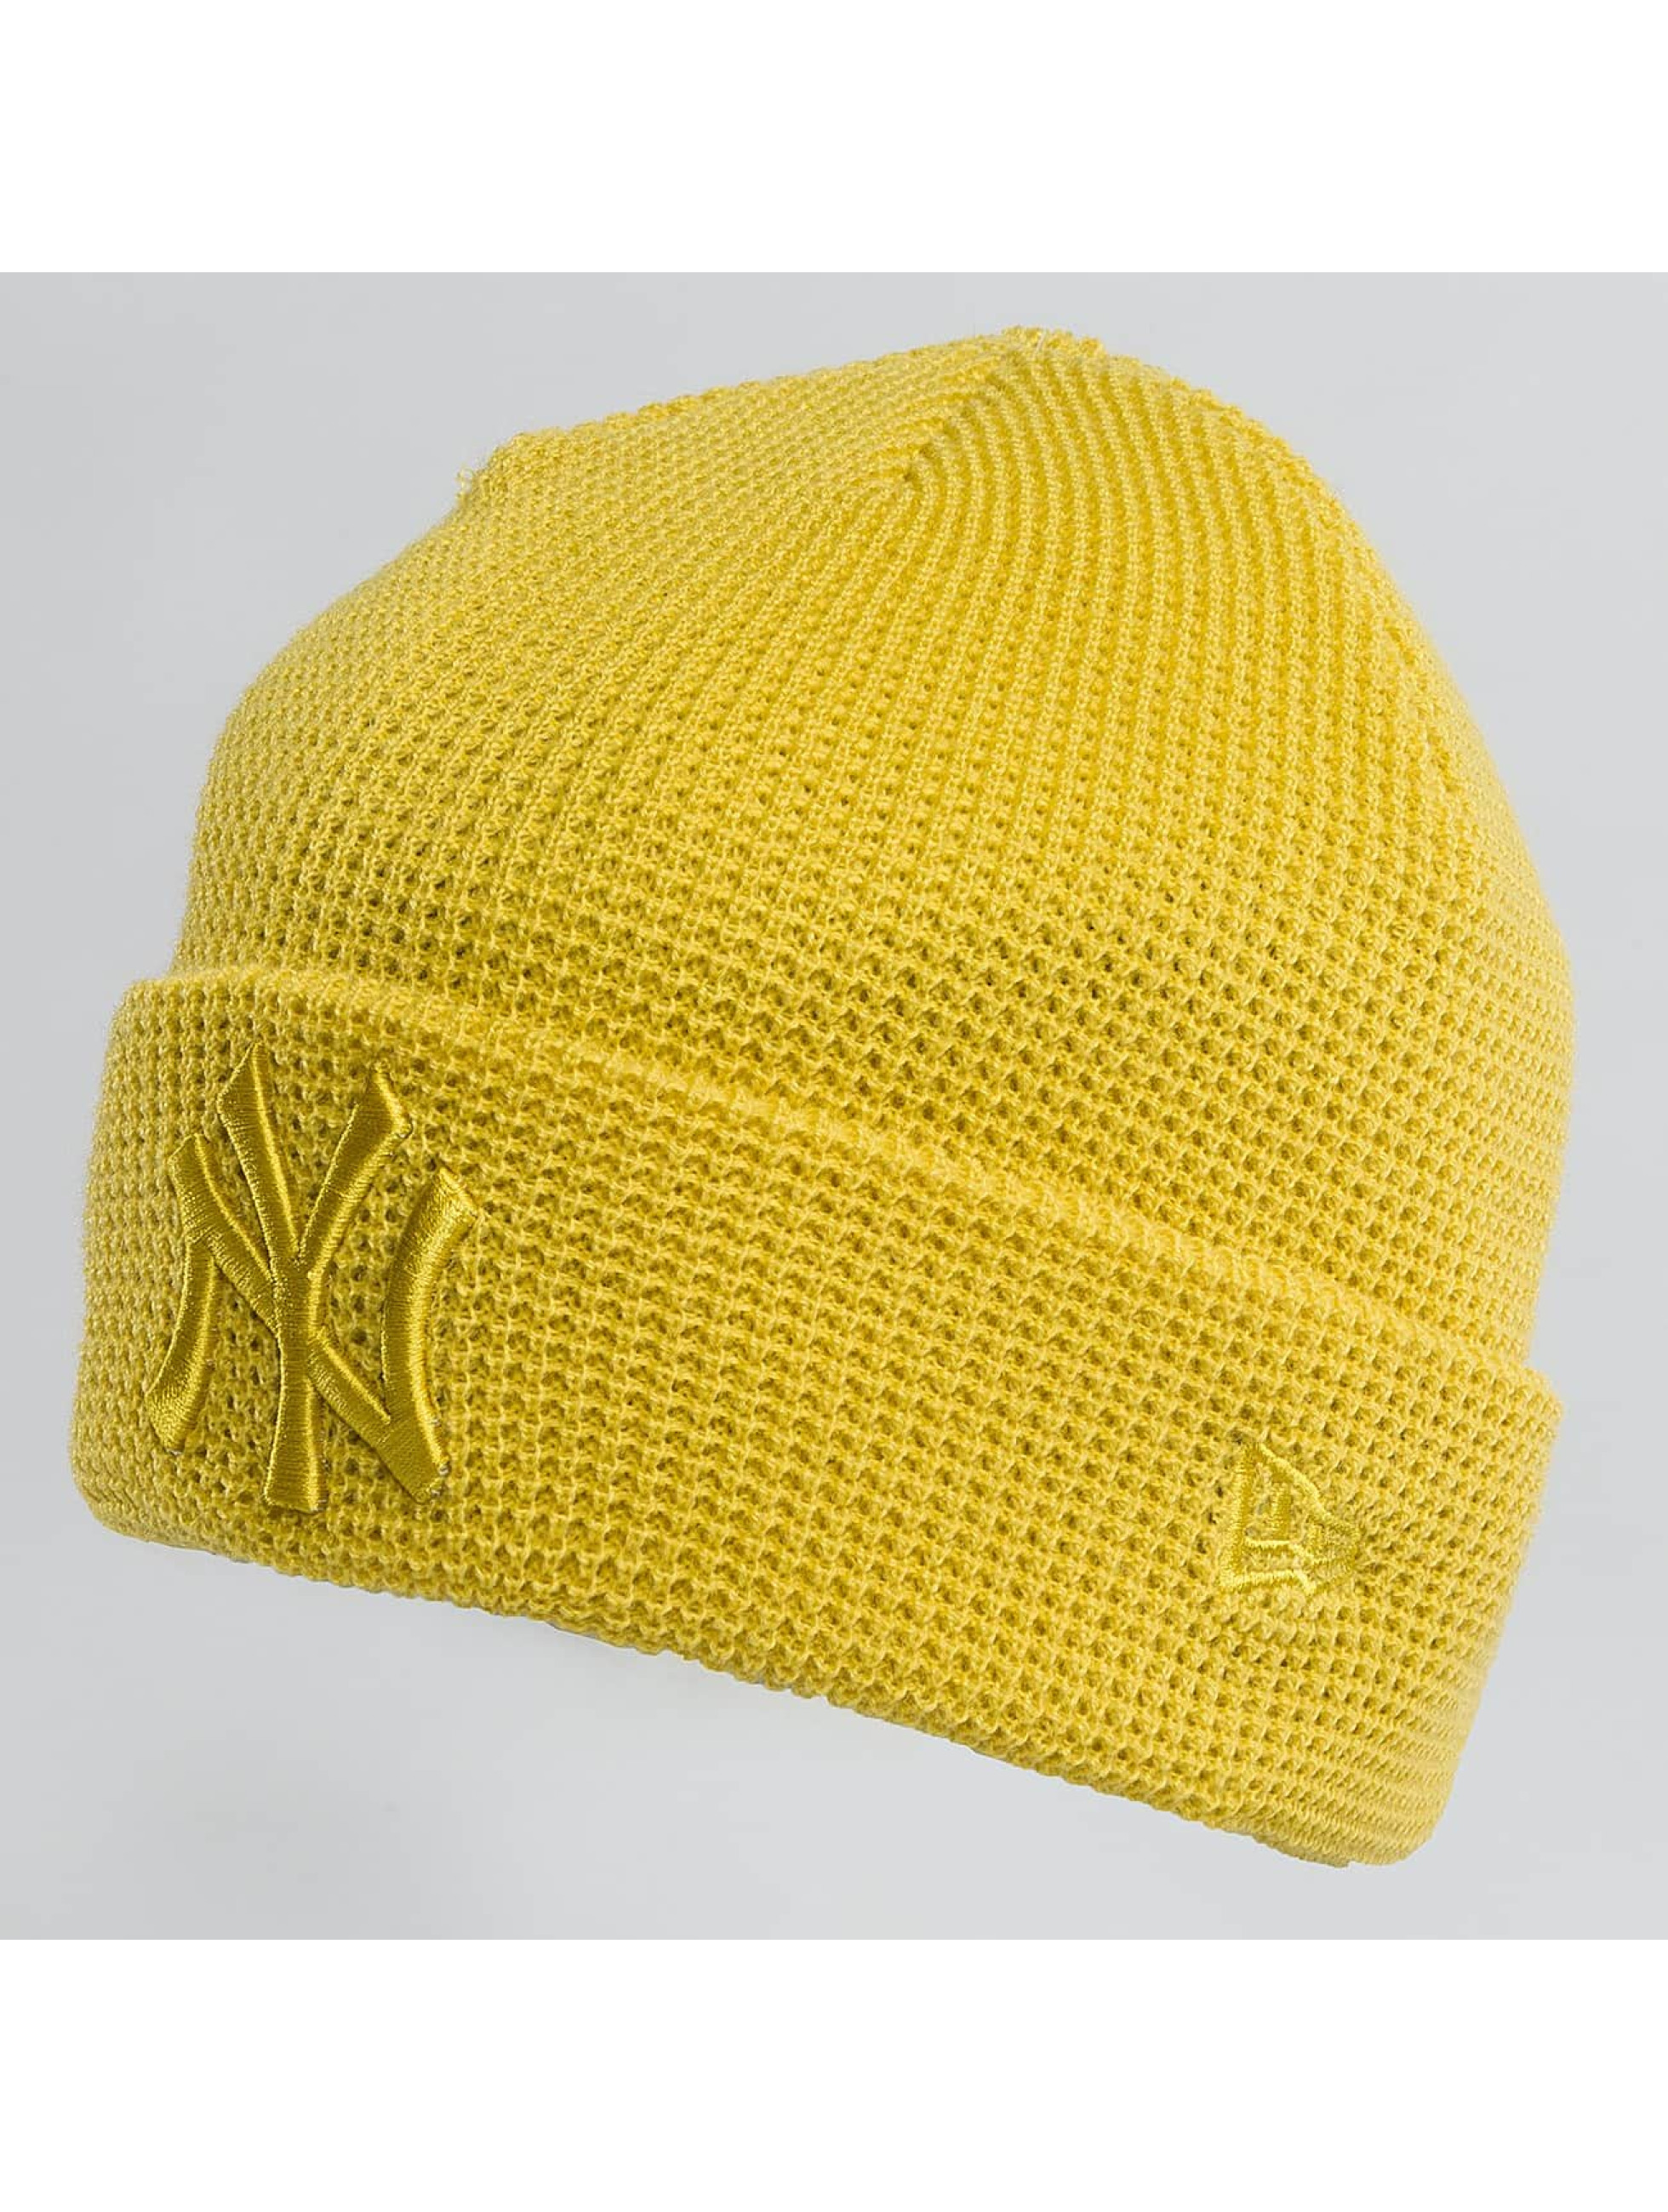 New Era Bonnet New Era Essential Waffle Knit NY Yankees Beanie Open Market jaune